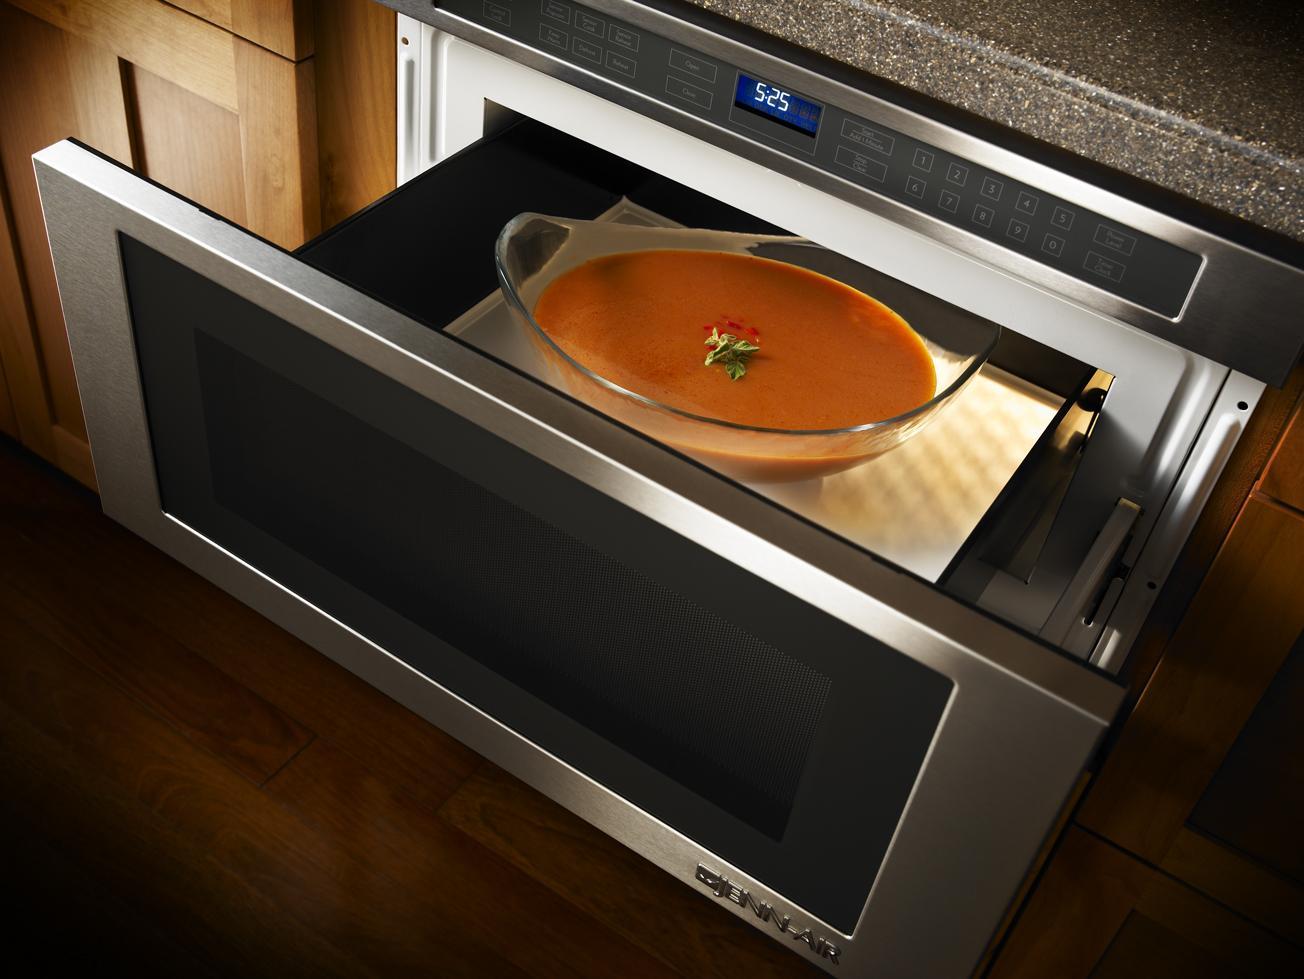 Jenn Air Microwave >> JMD2124WS | Jenn-air jmd2124ws | Countertop Microwaves